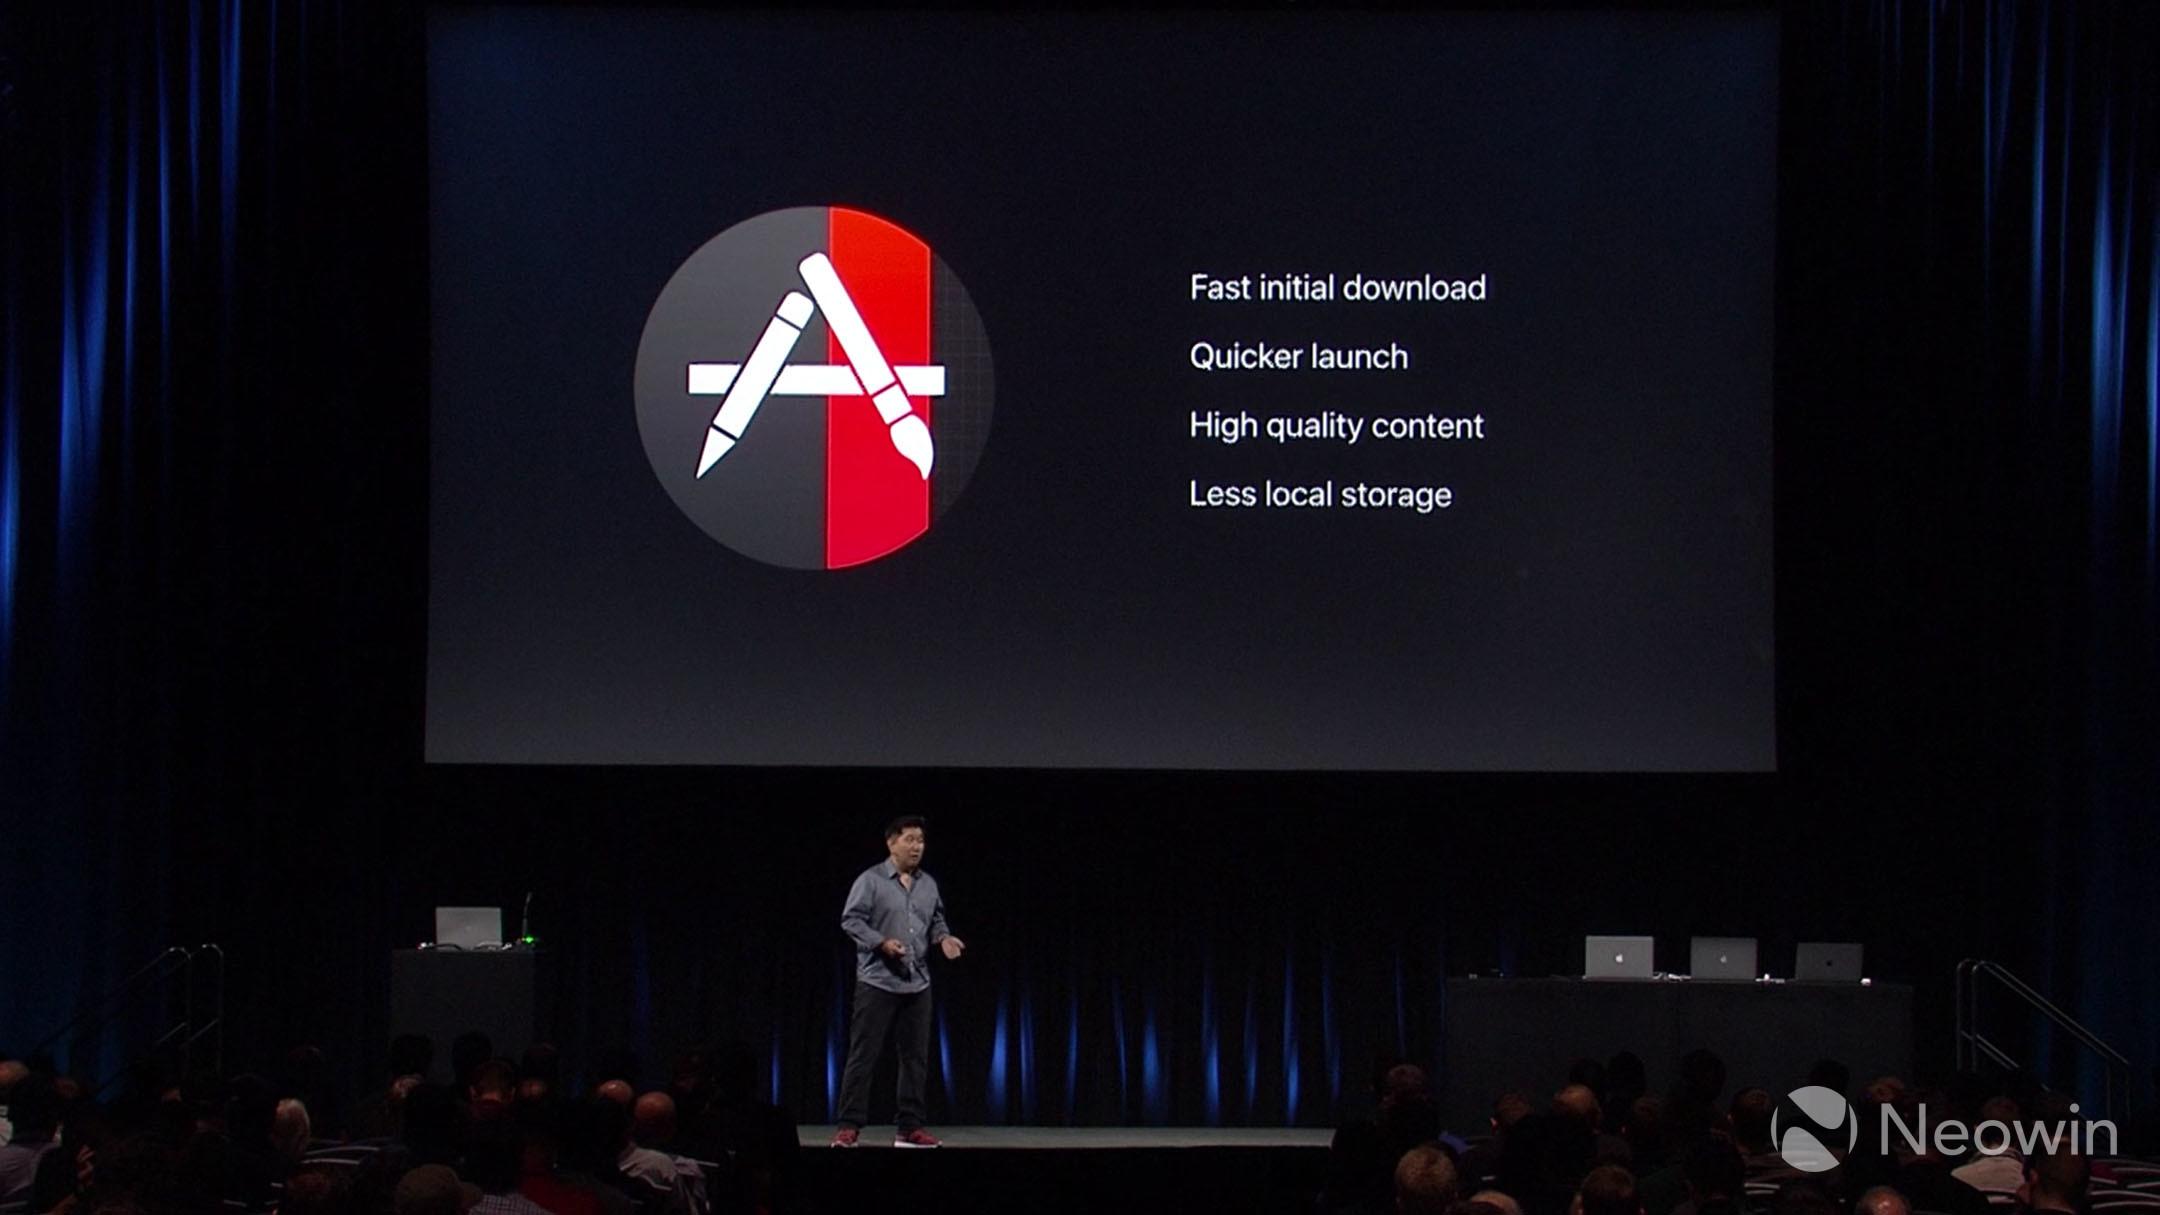 Apple formally announces tvOS 11 - Neowin